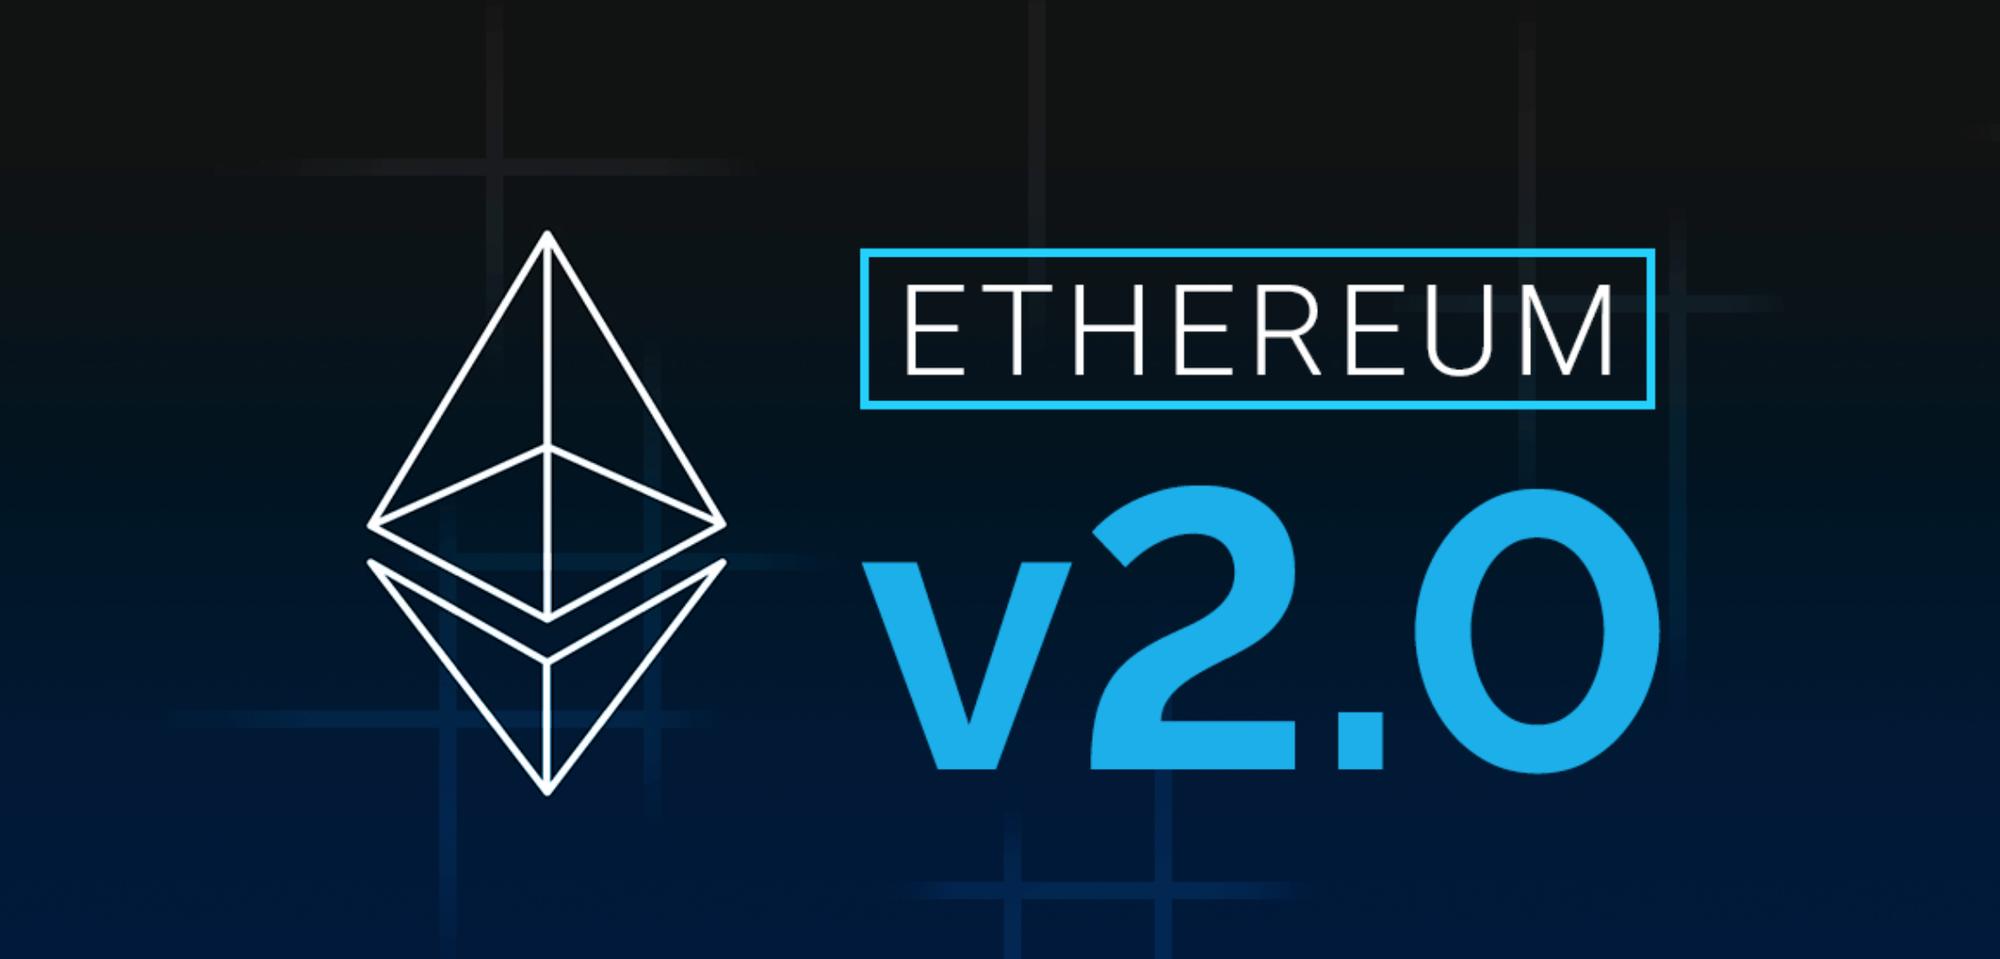 ethereum 2 0 header - تیم توسعه دهنده ی اتریوم 2.0 از انتشار نسخه ی v1.0.0 خبر داد!